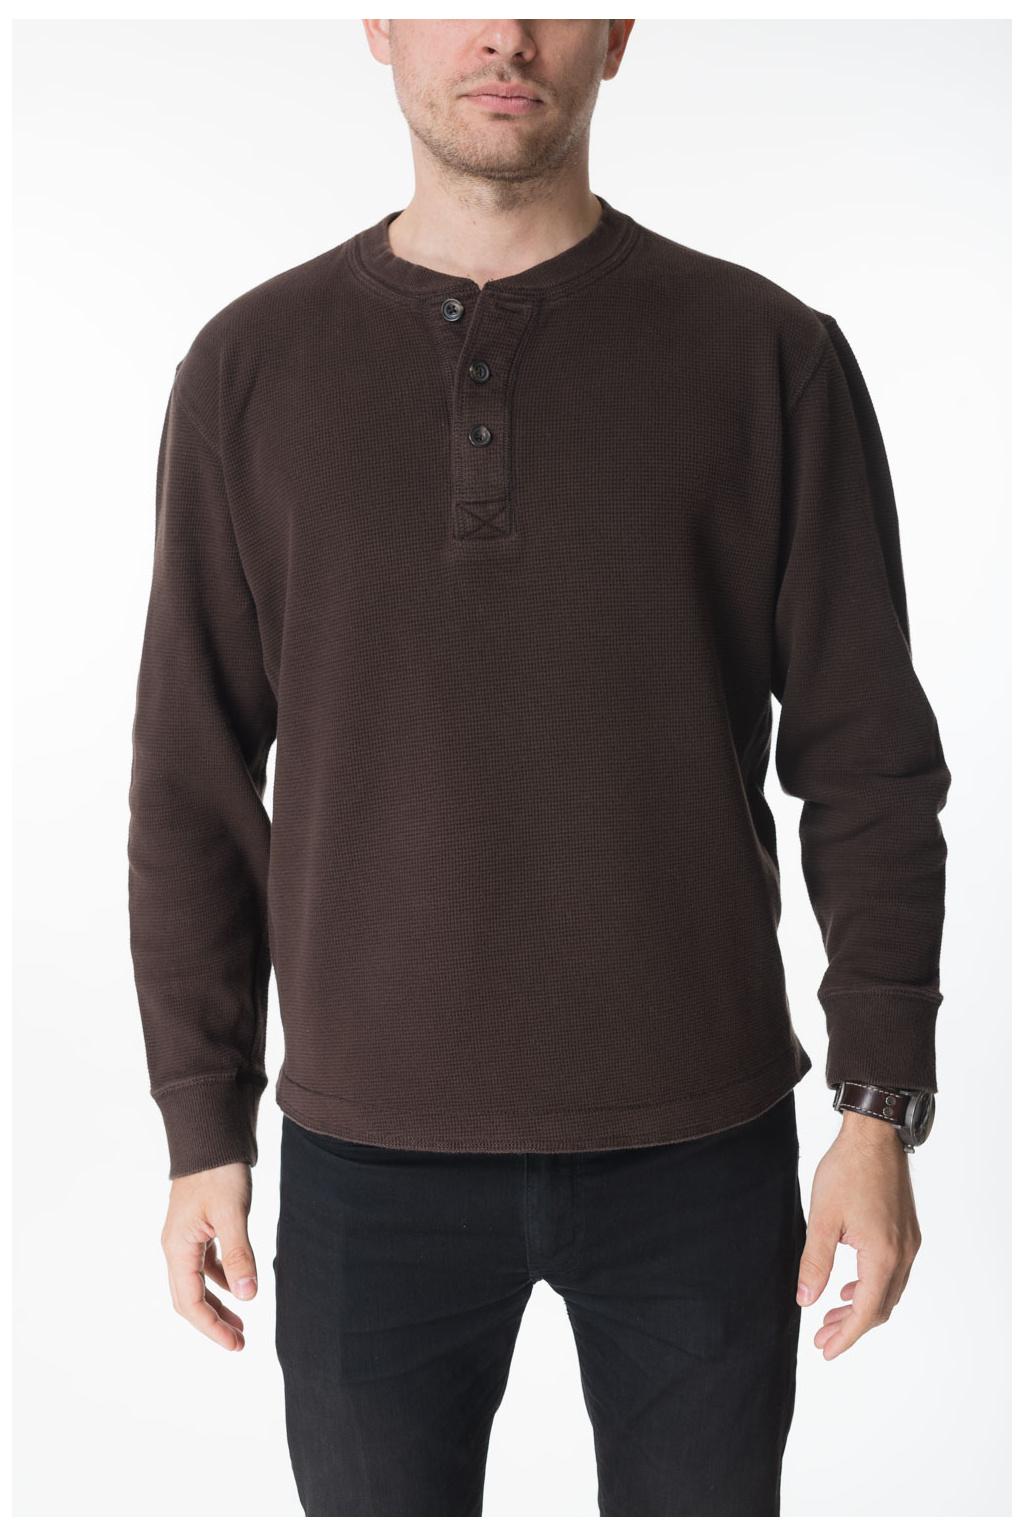 Tričko Hnědé